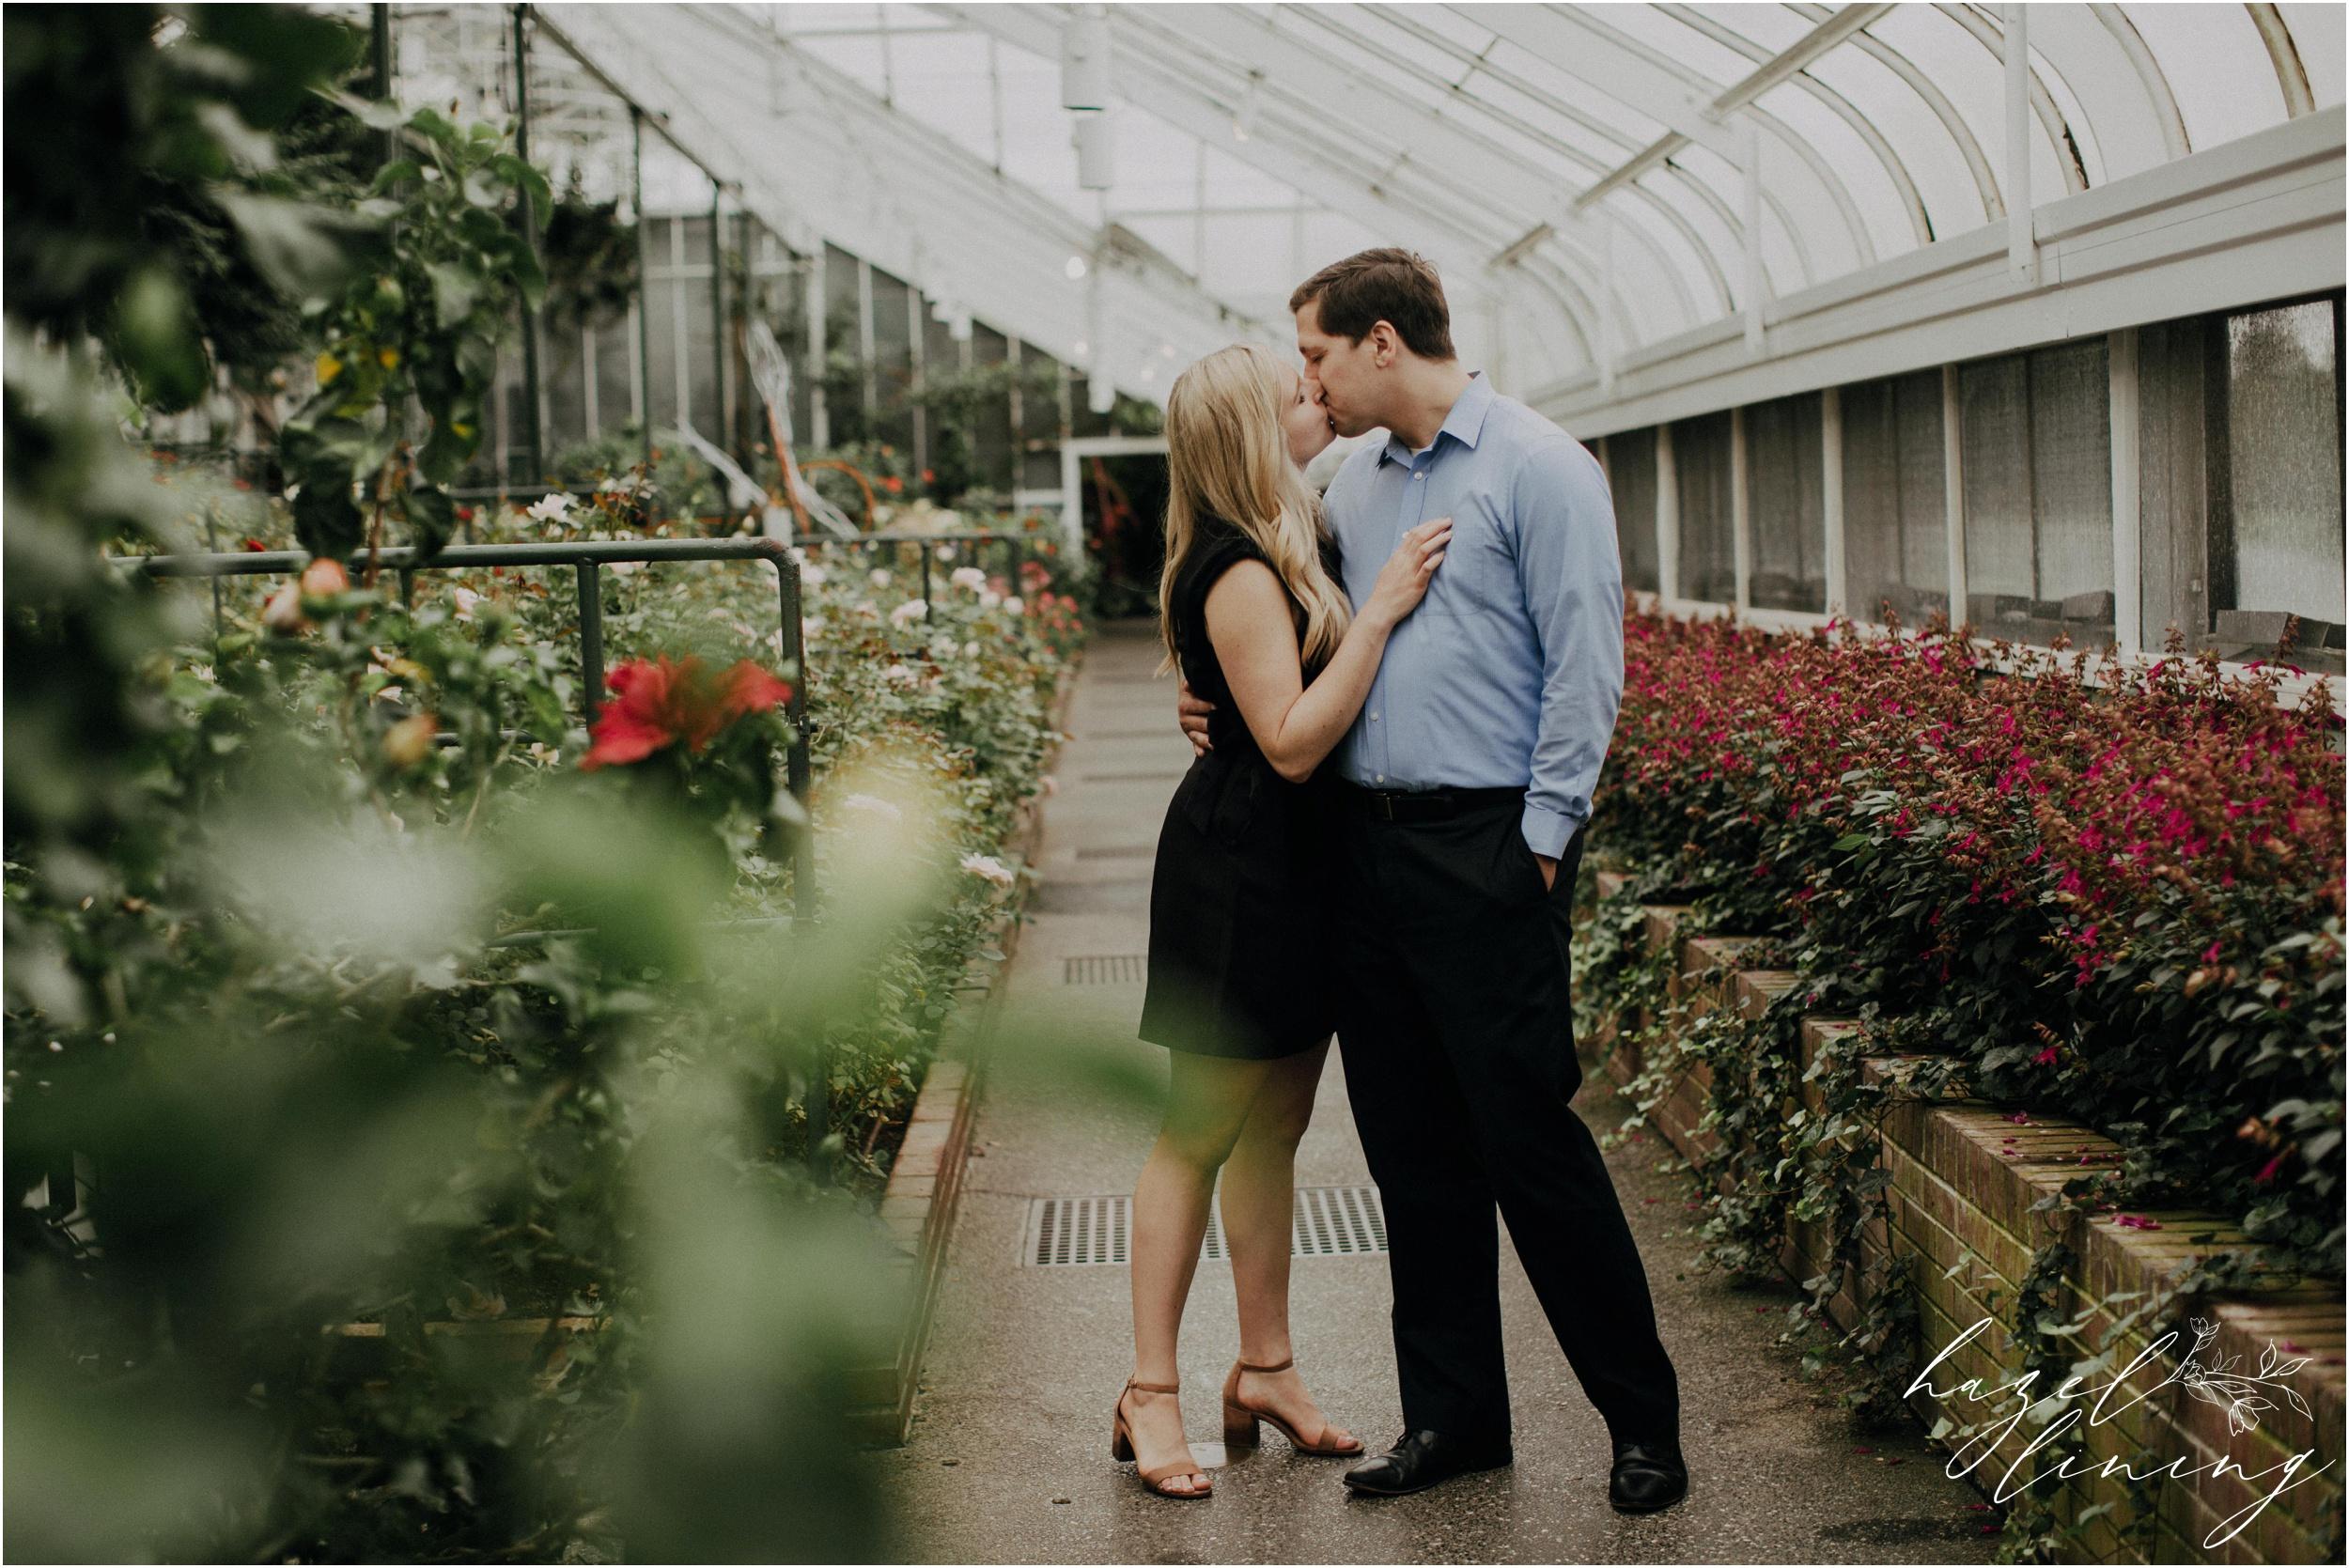 victoria-travis-logan-mayes-longwood-gardens-kennett-square-philadelphia-engagement-session-hazel-lining-photography-destination-elopement-wedding-engagement-photography_0041.jpg